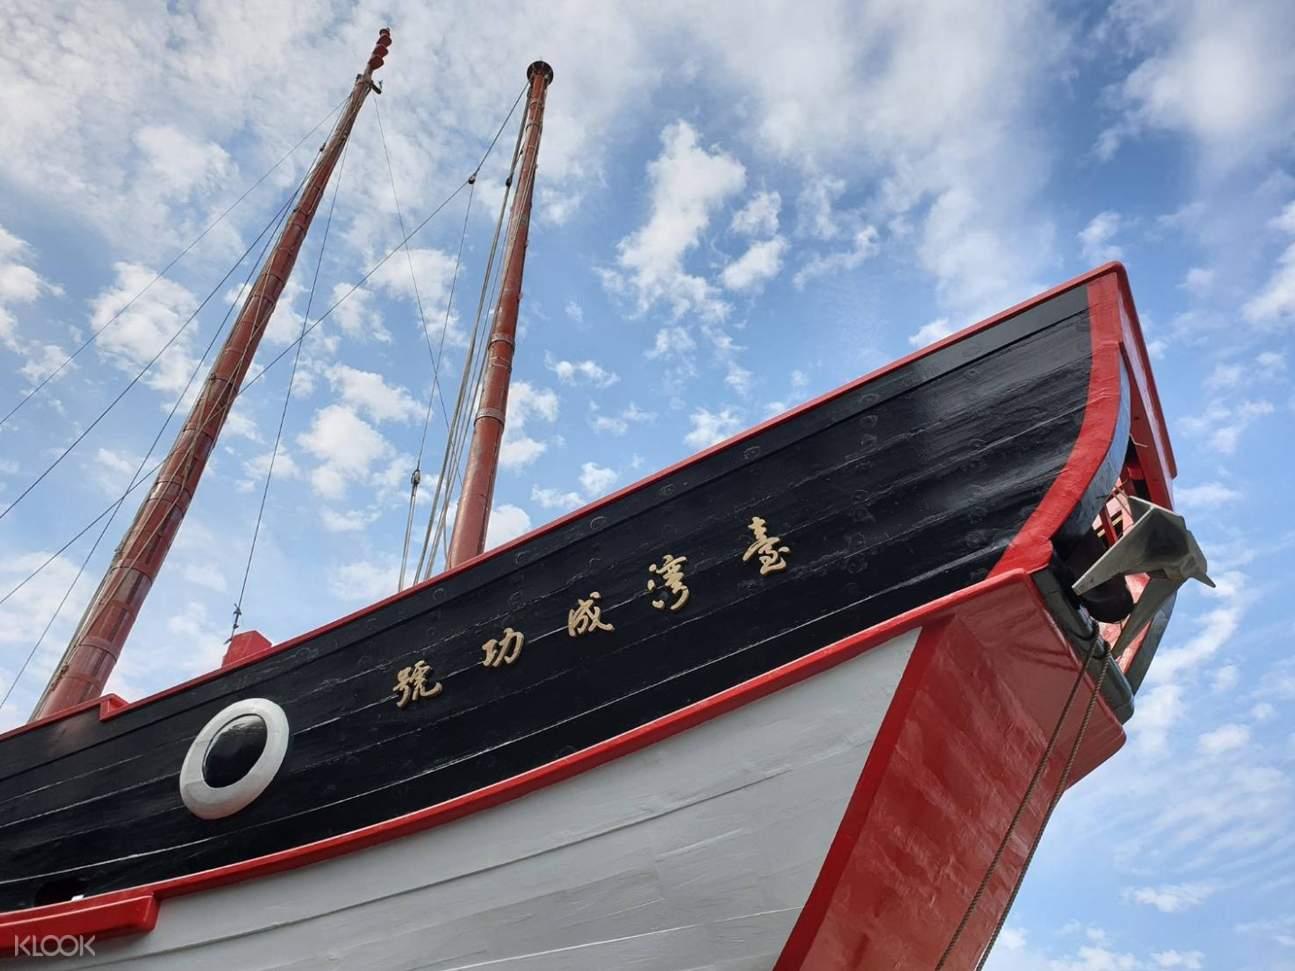 Sailing back to the maritime era on Taiwan warship.